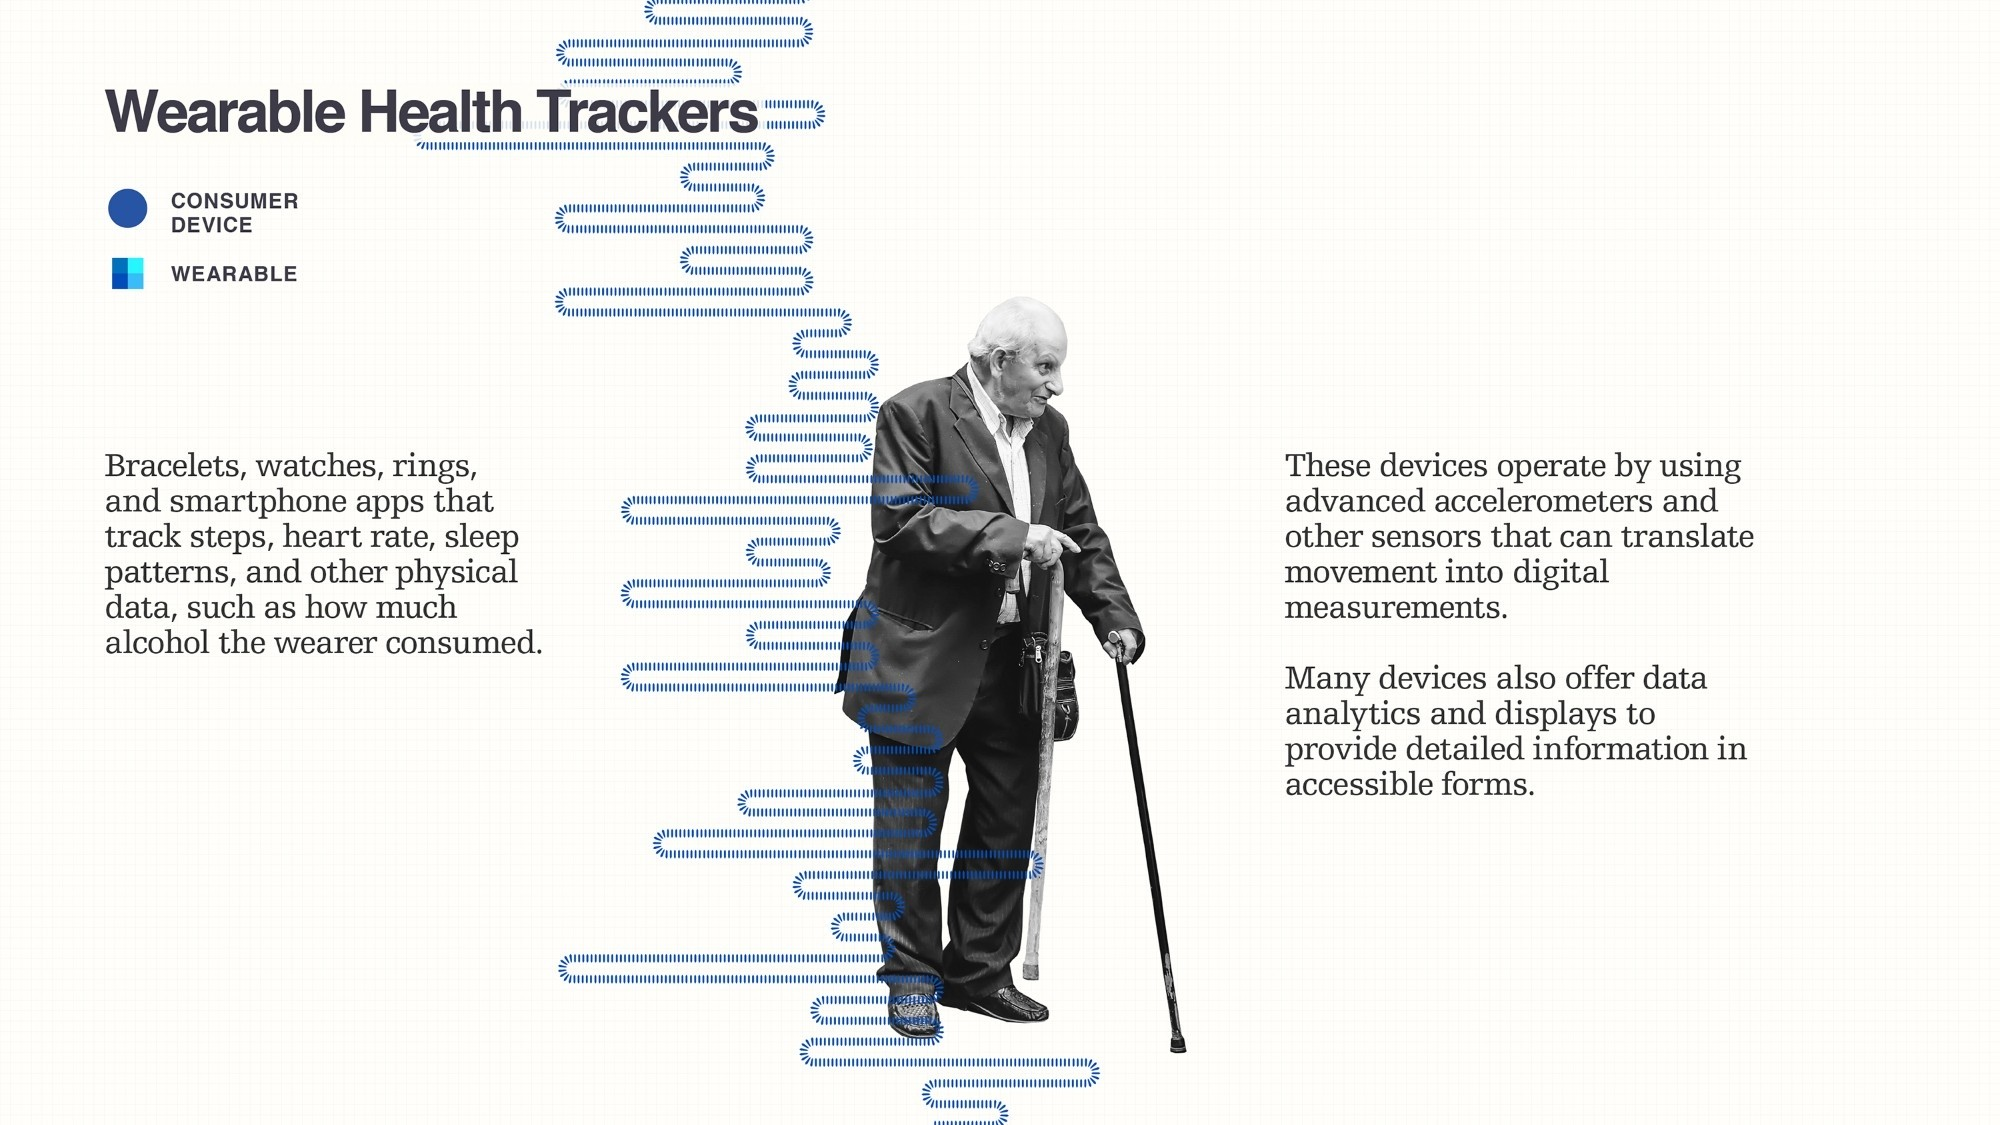 Data visualization illustrating wearable health trackers by Gioriga Lupi.